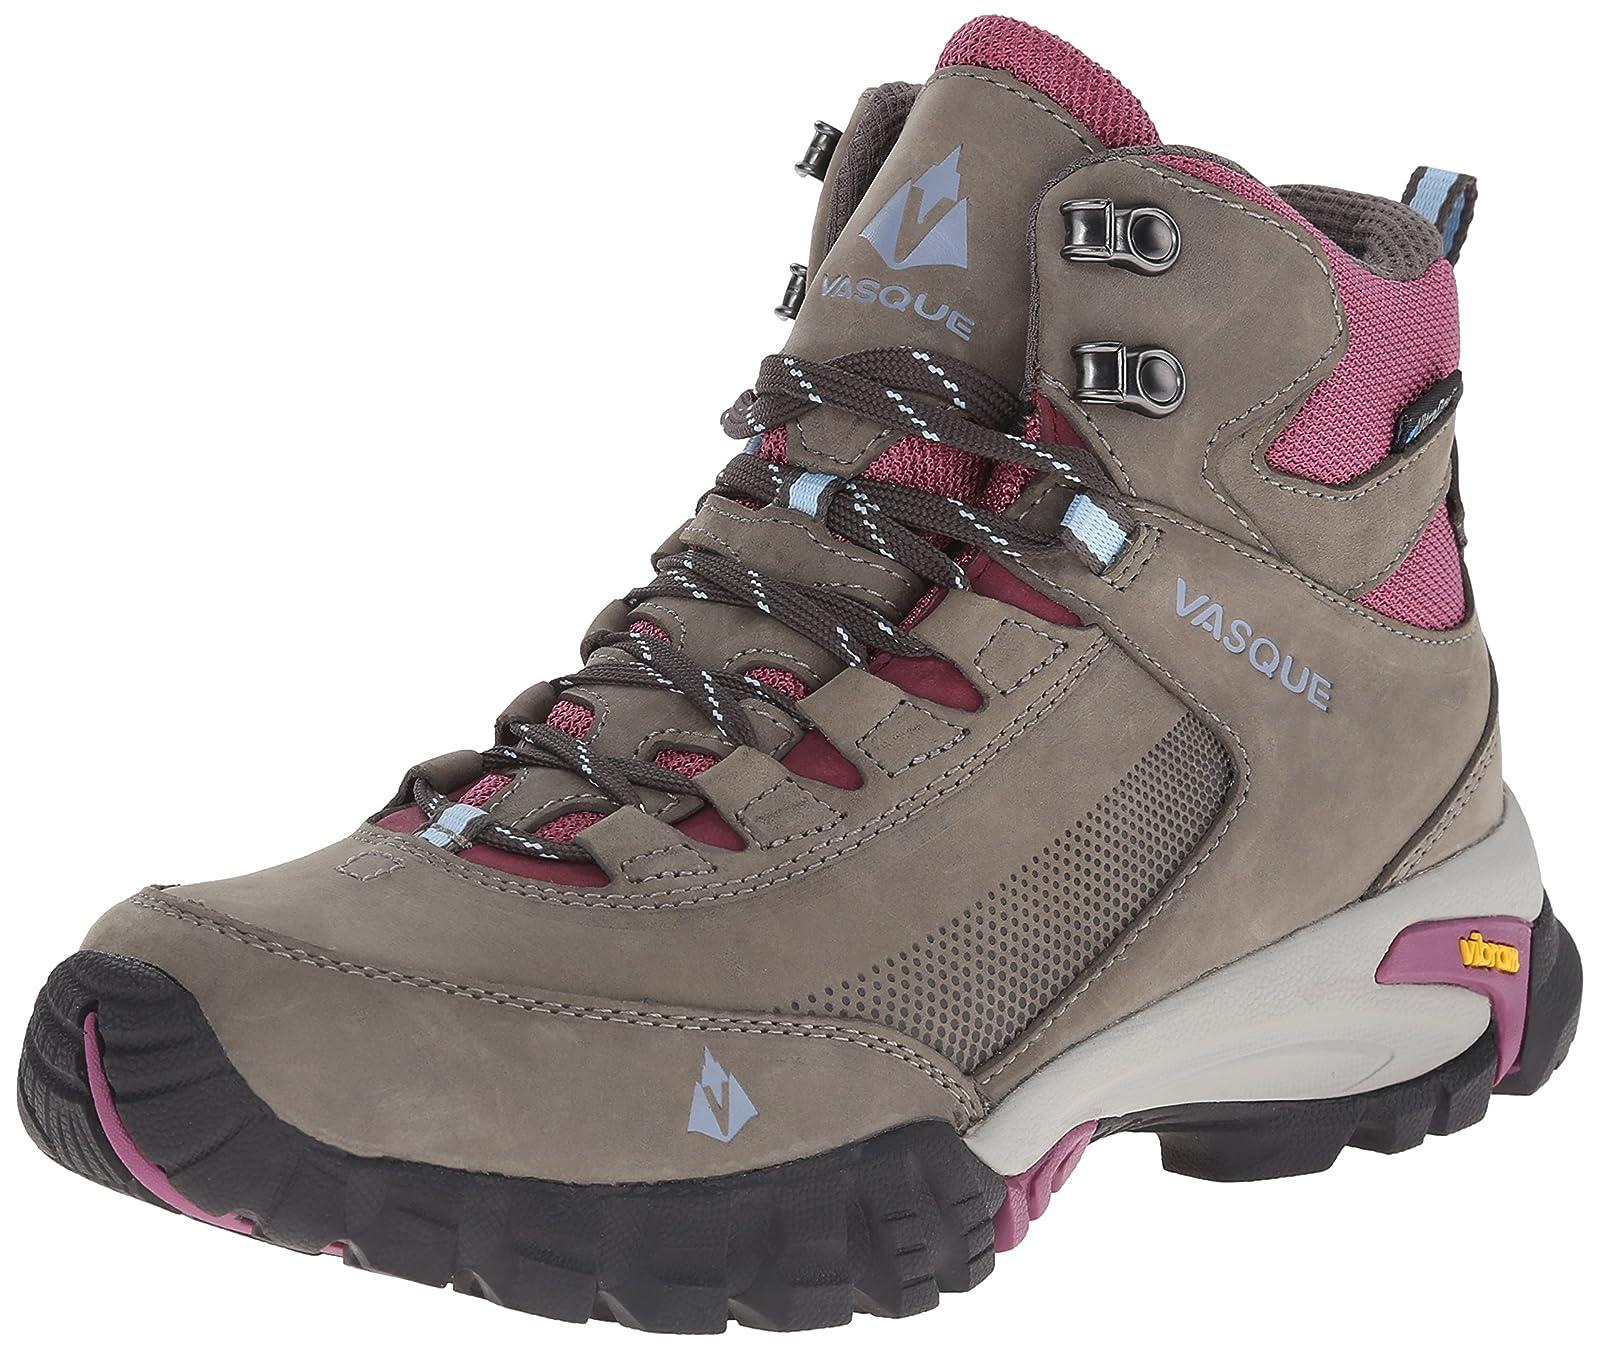 Vasque Women's Talus Trek UltraDry Hiking Boot US - 7